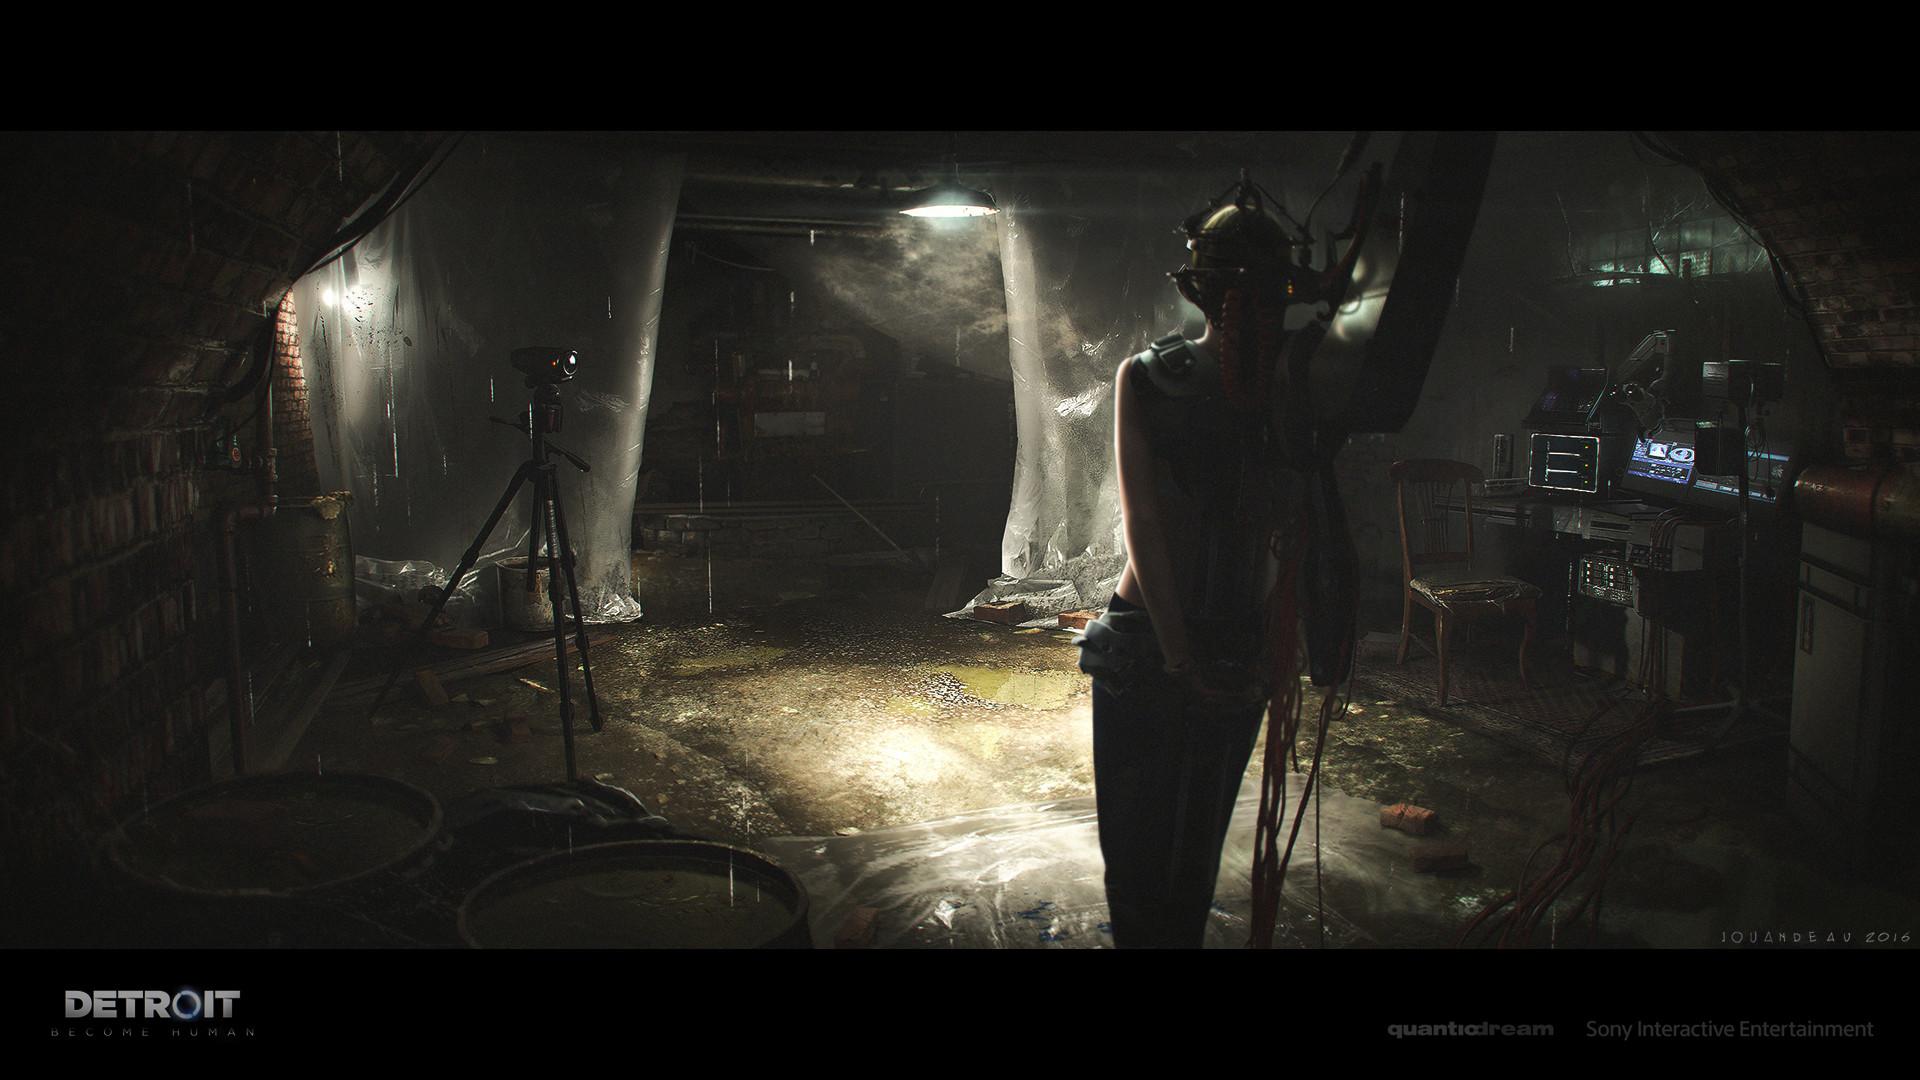 Romain jouandeau decor act ii s05k kara zlatko basement atelier v06